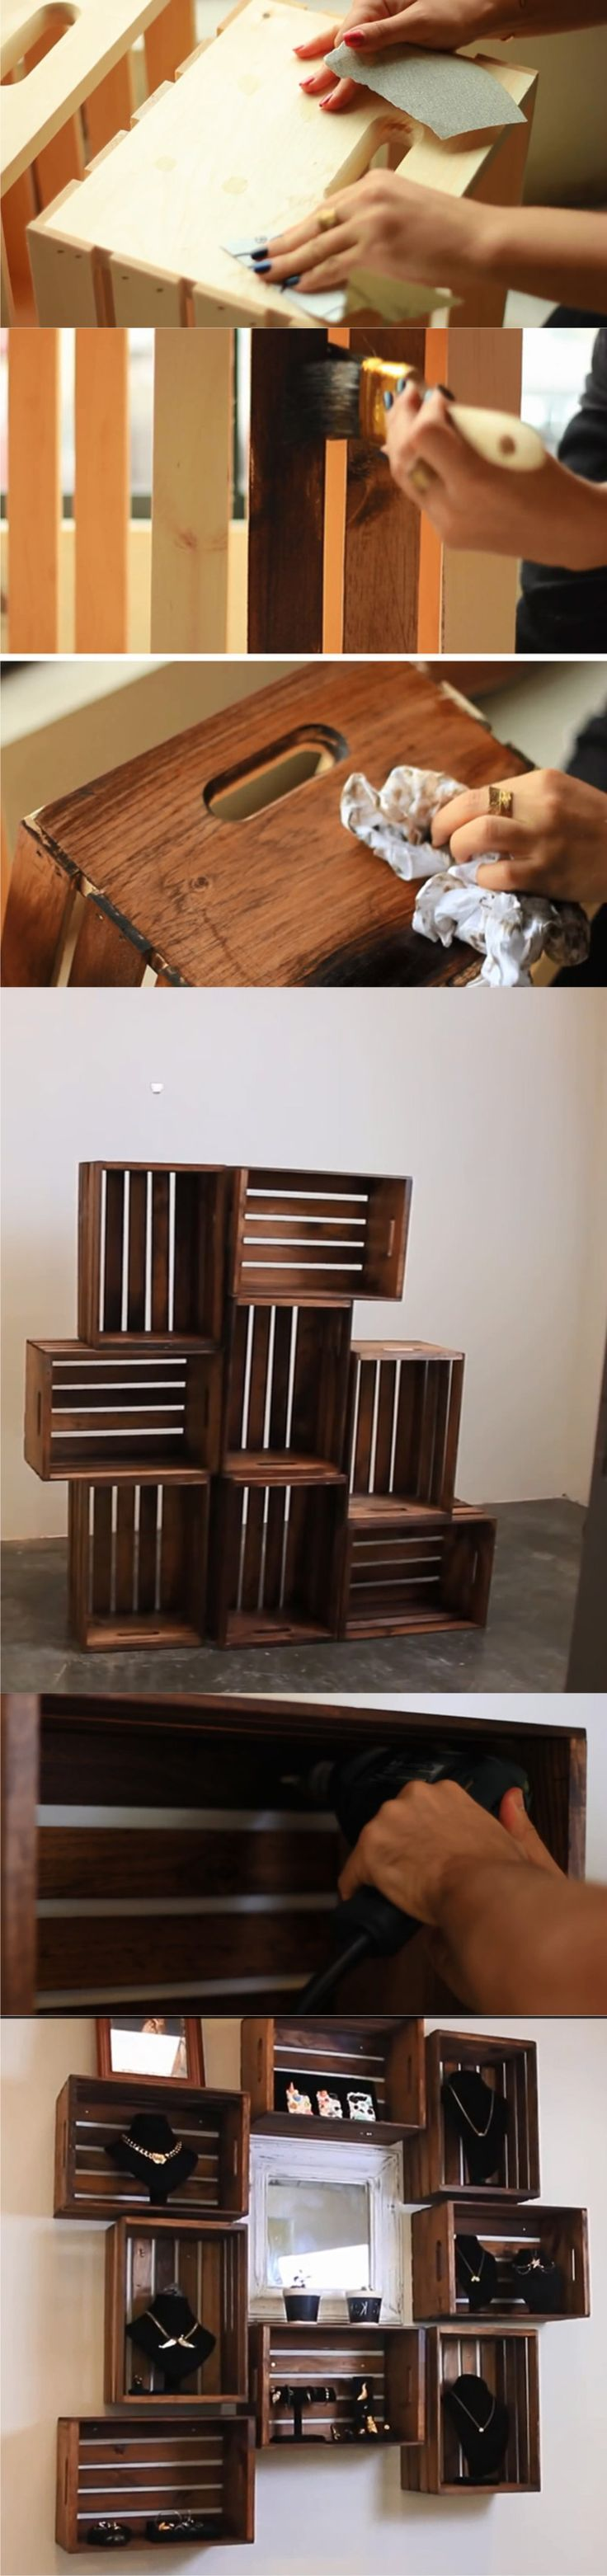 Estanter A Con Cajas De Madera Caja De Madera Cajas Y Madera # Muebles De Jabas De Madera